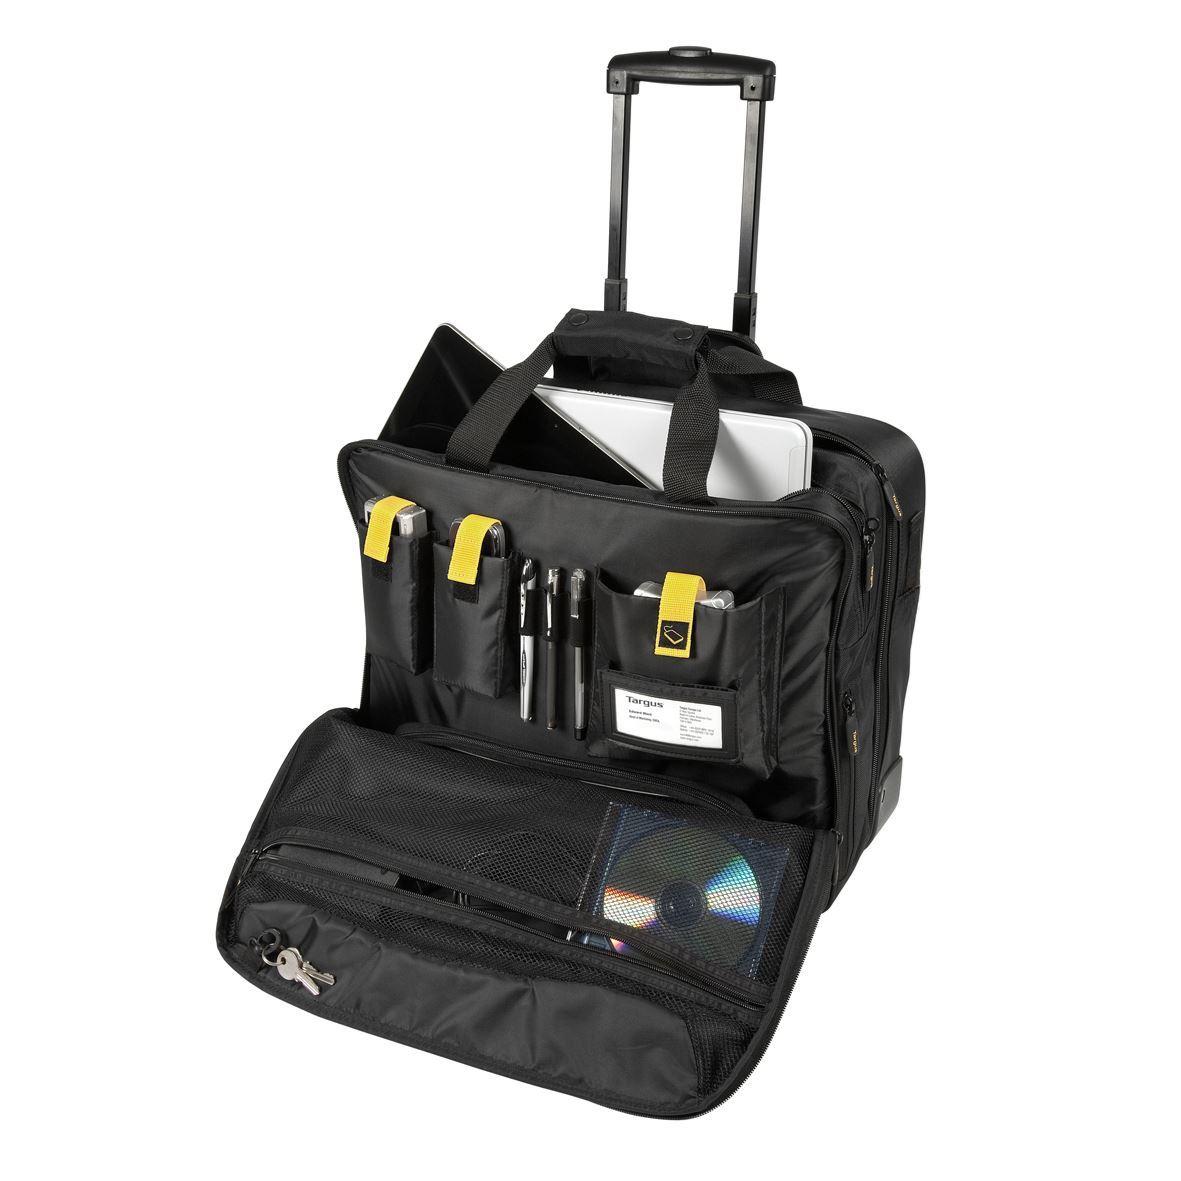 targus briefcase photo - 1